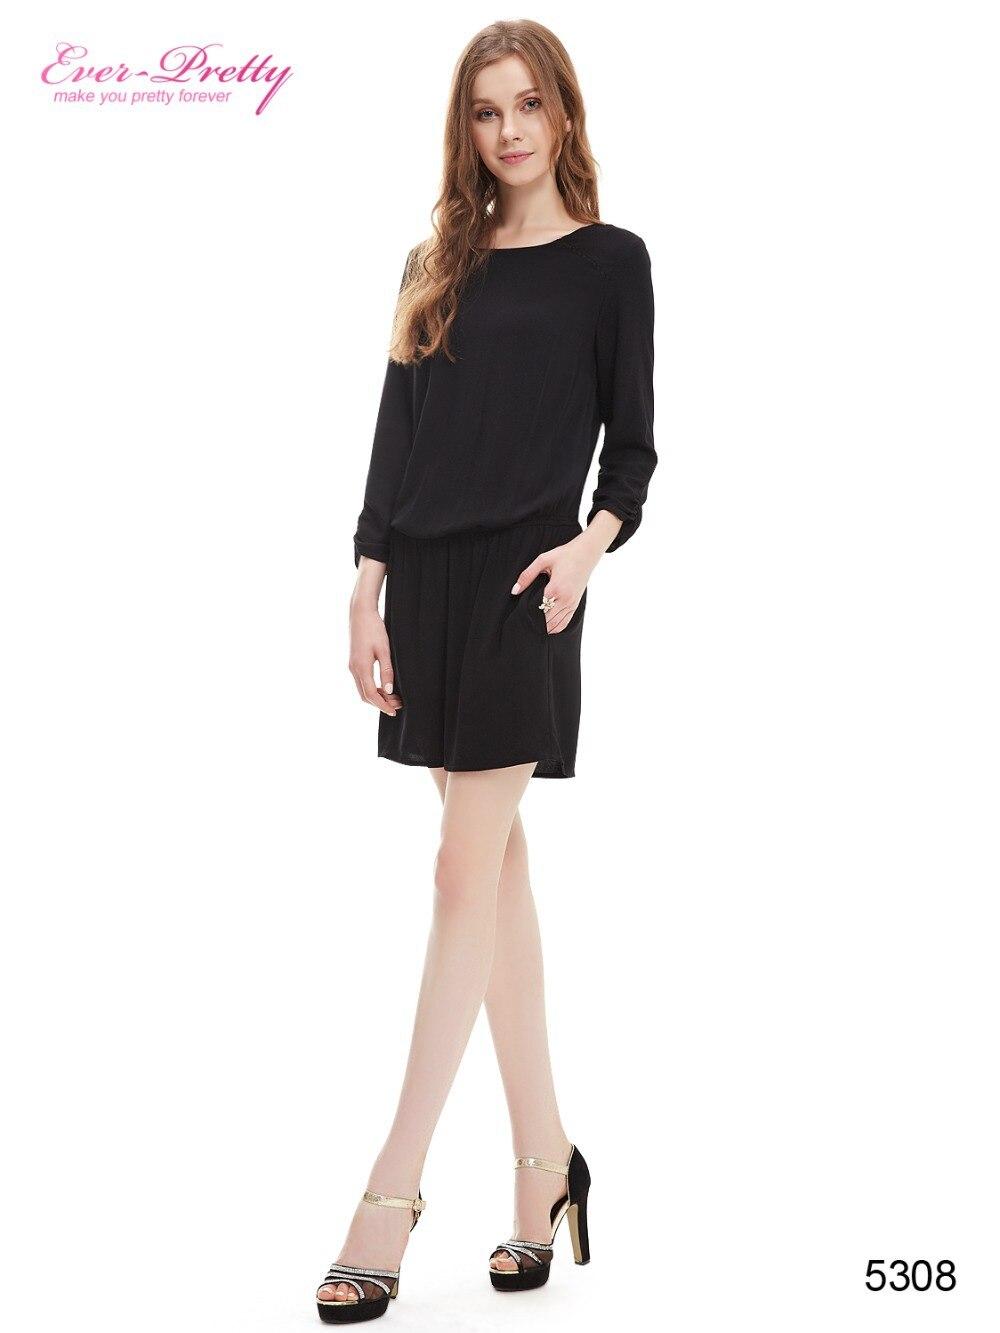 [Clearance Sale] Summer Style Vestidos Cocktail Dress Black Siamesed Dresses Women ...